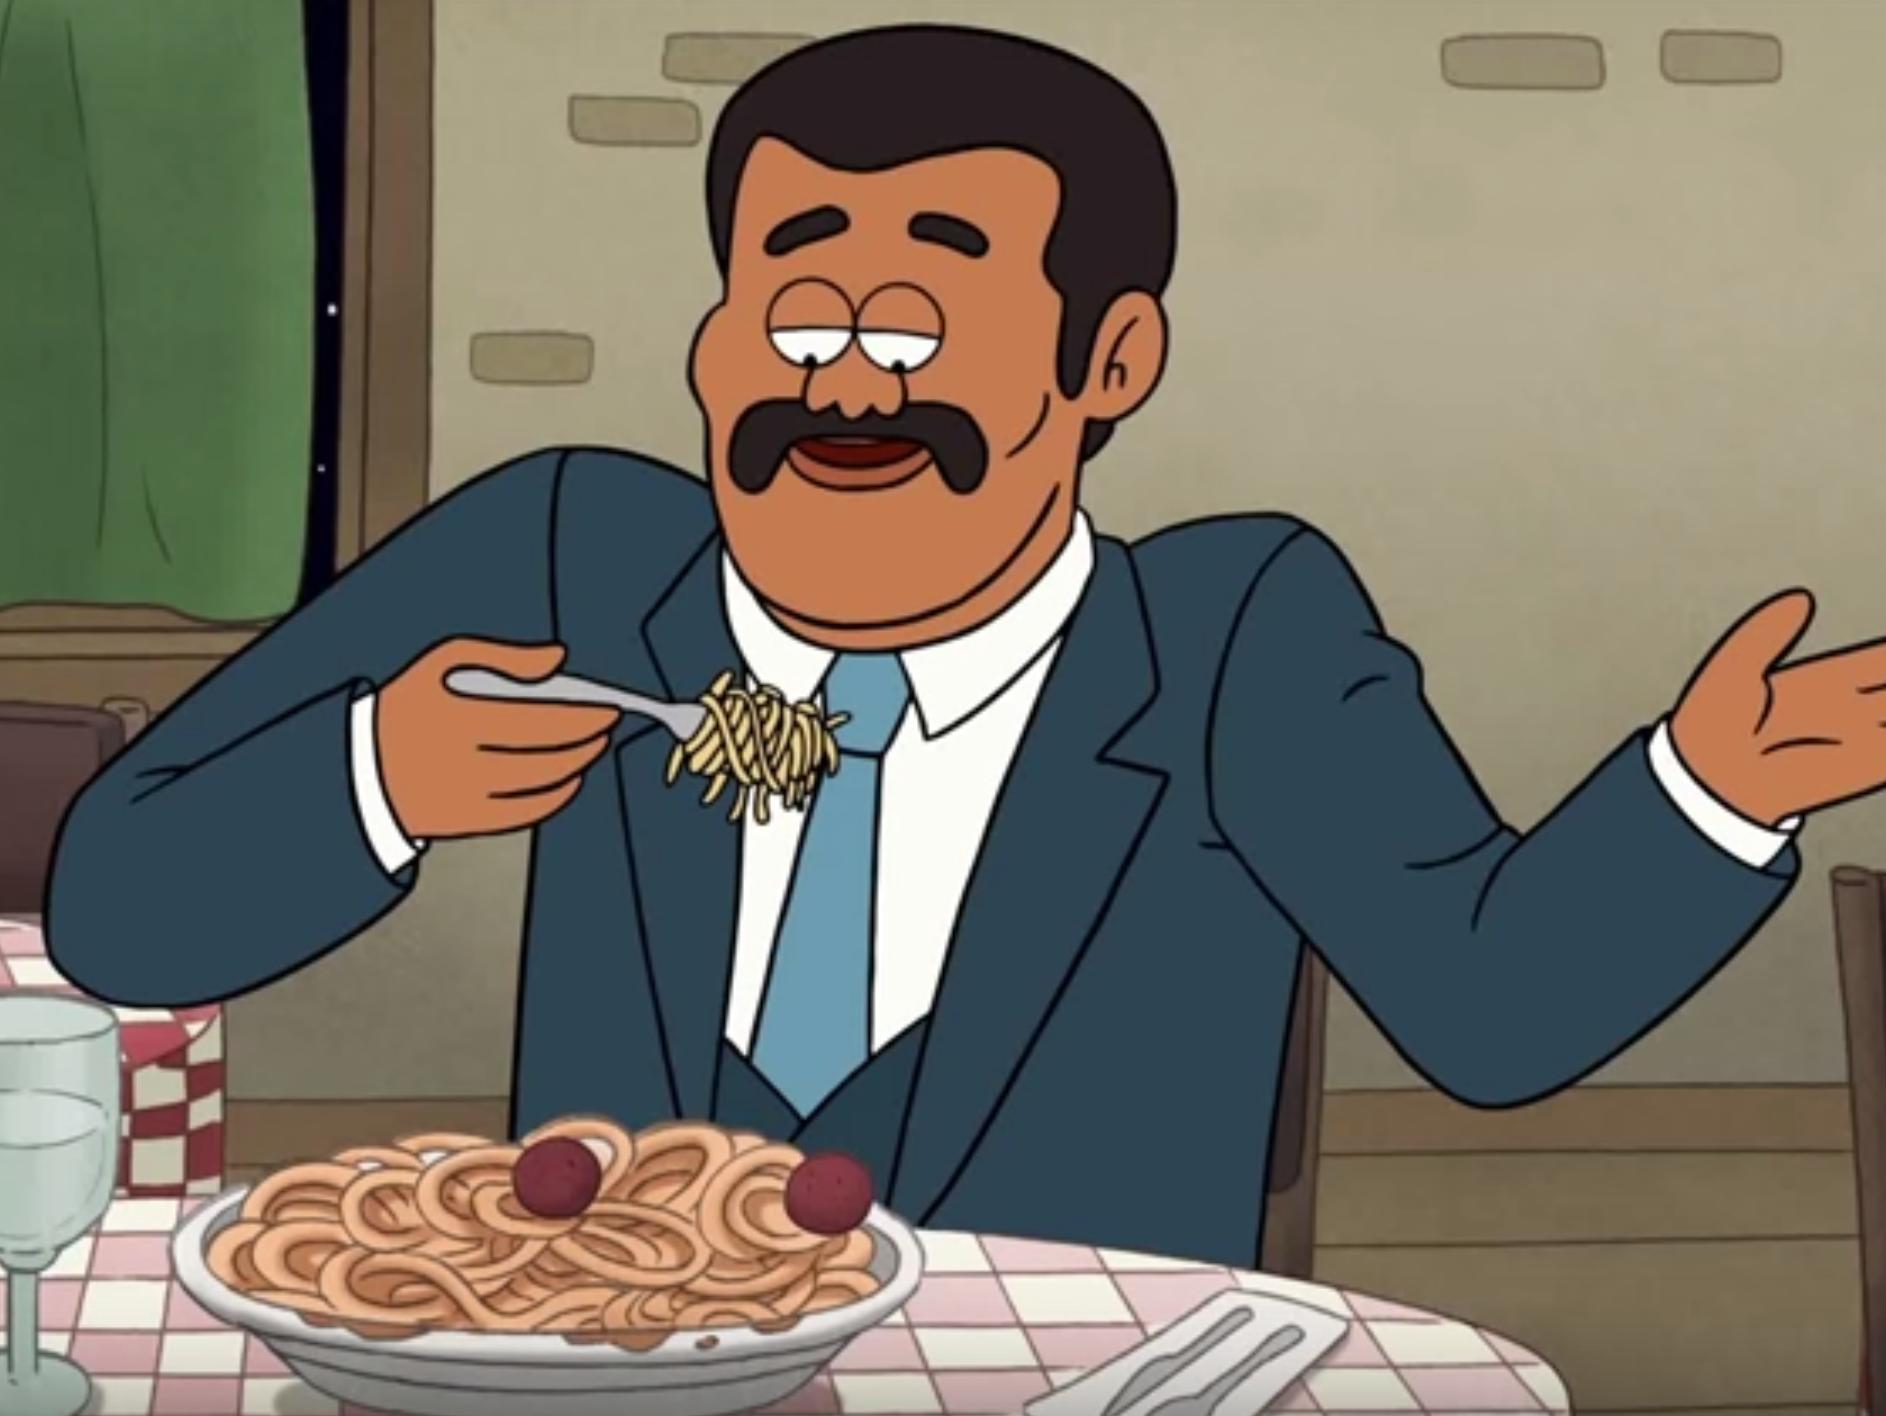 Cartoon Neil deGrasse Tyson Schools Us in Spaghettification